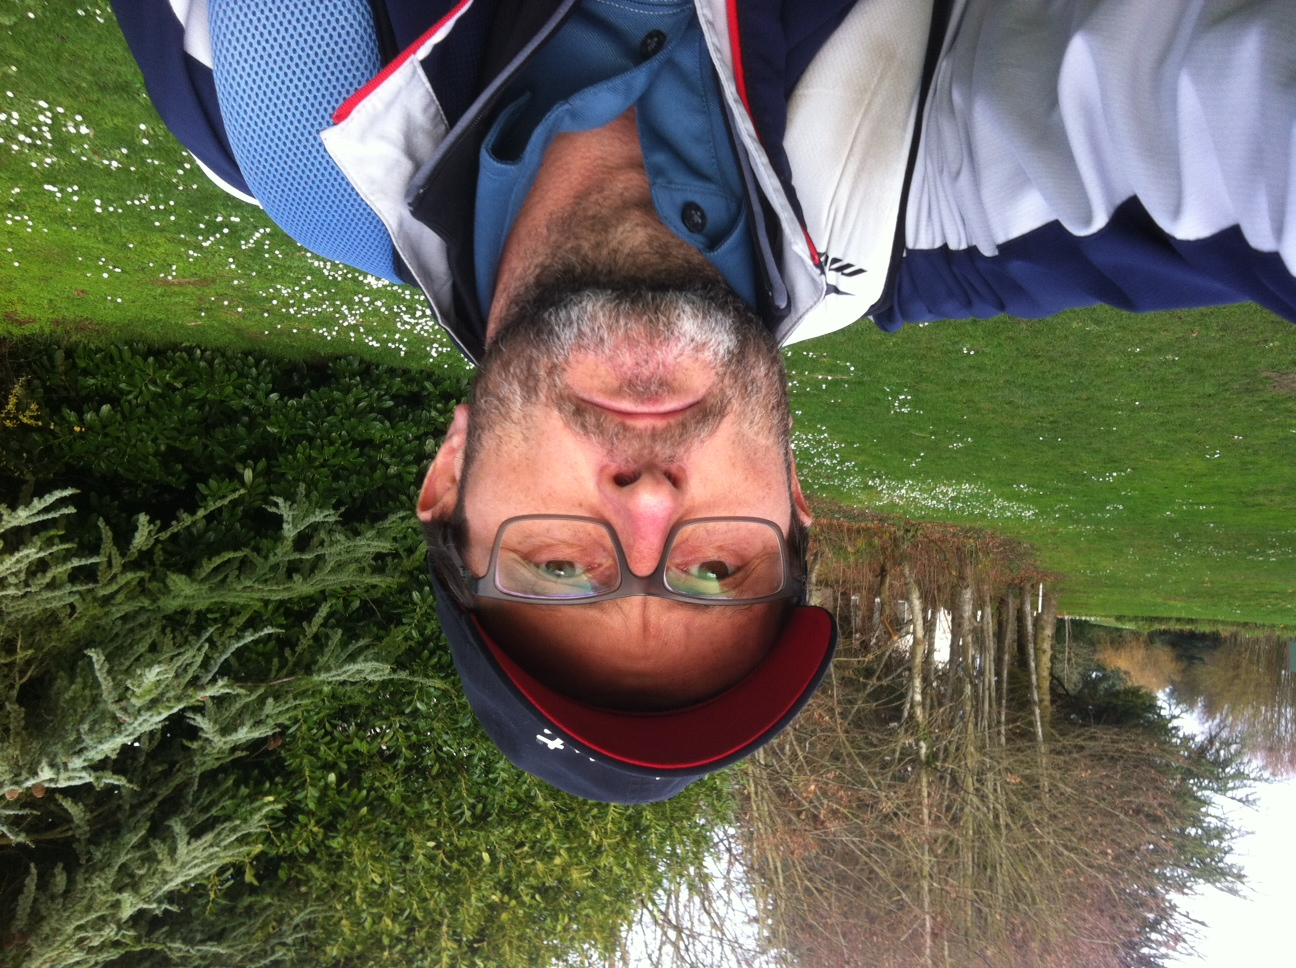 Avatar of golfer named Philippe Petit